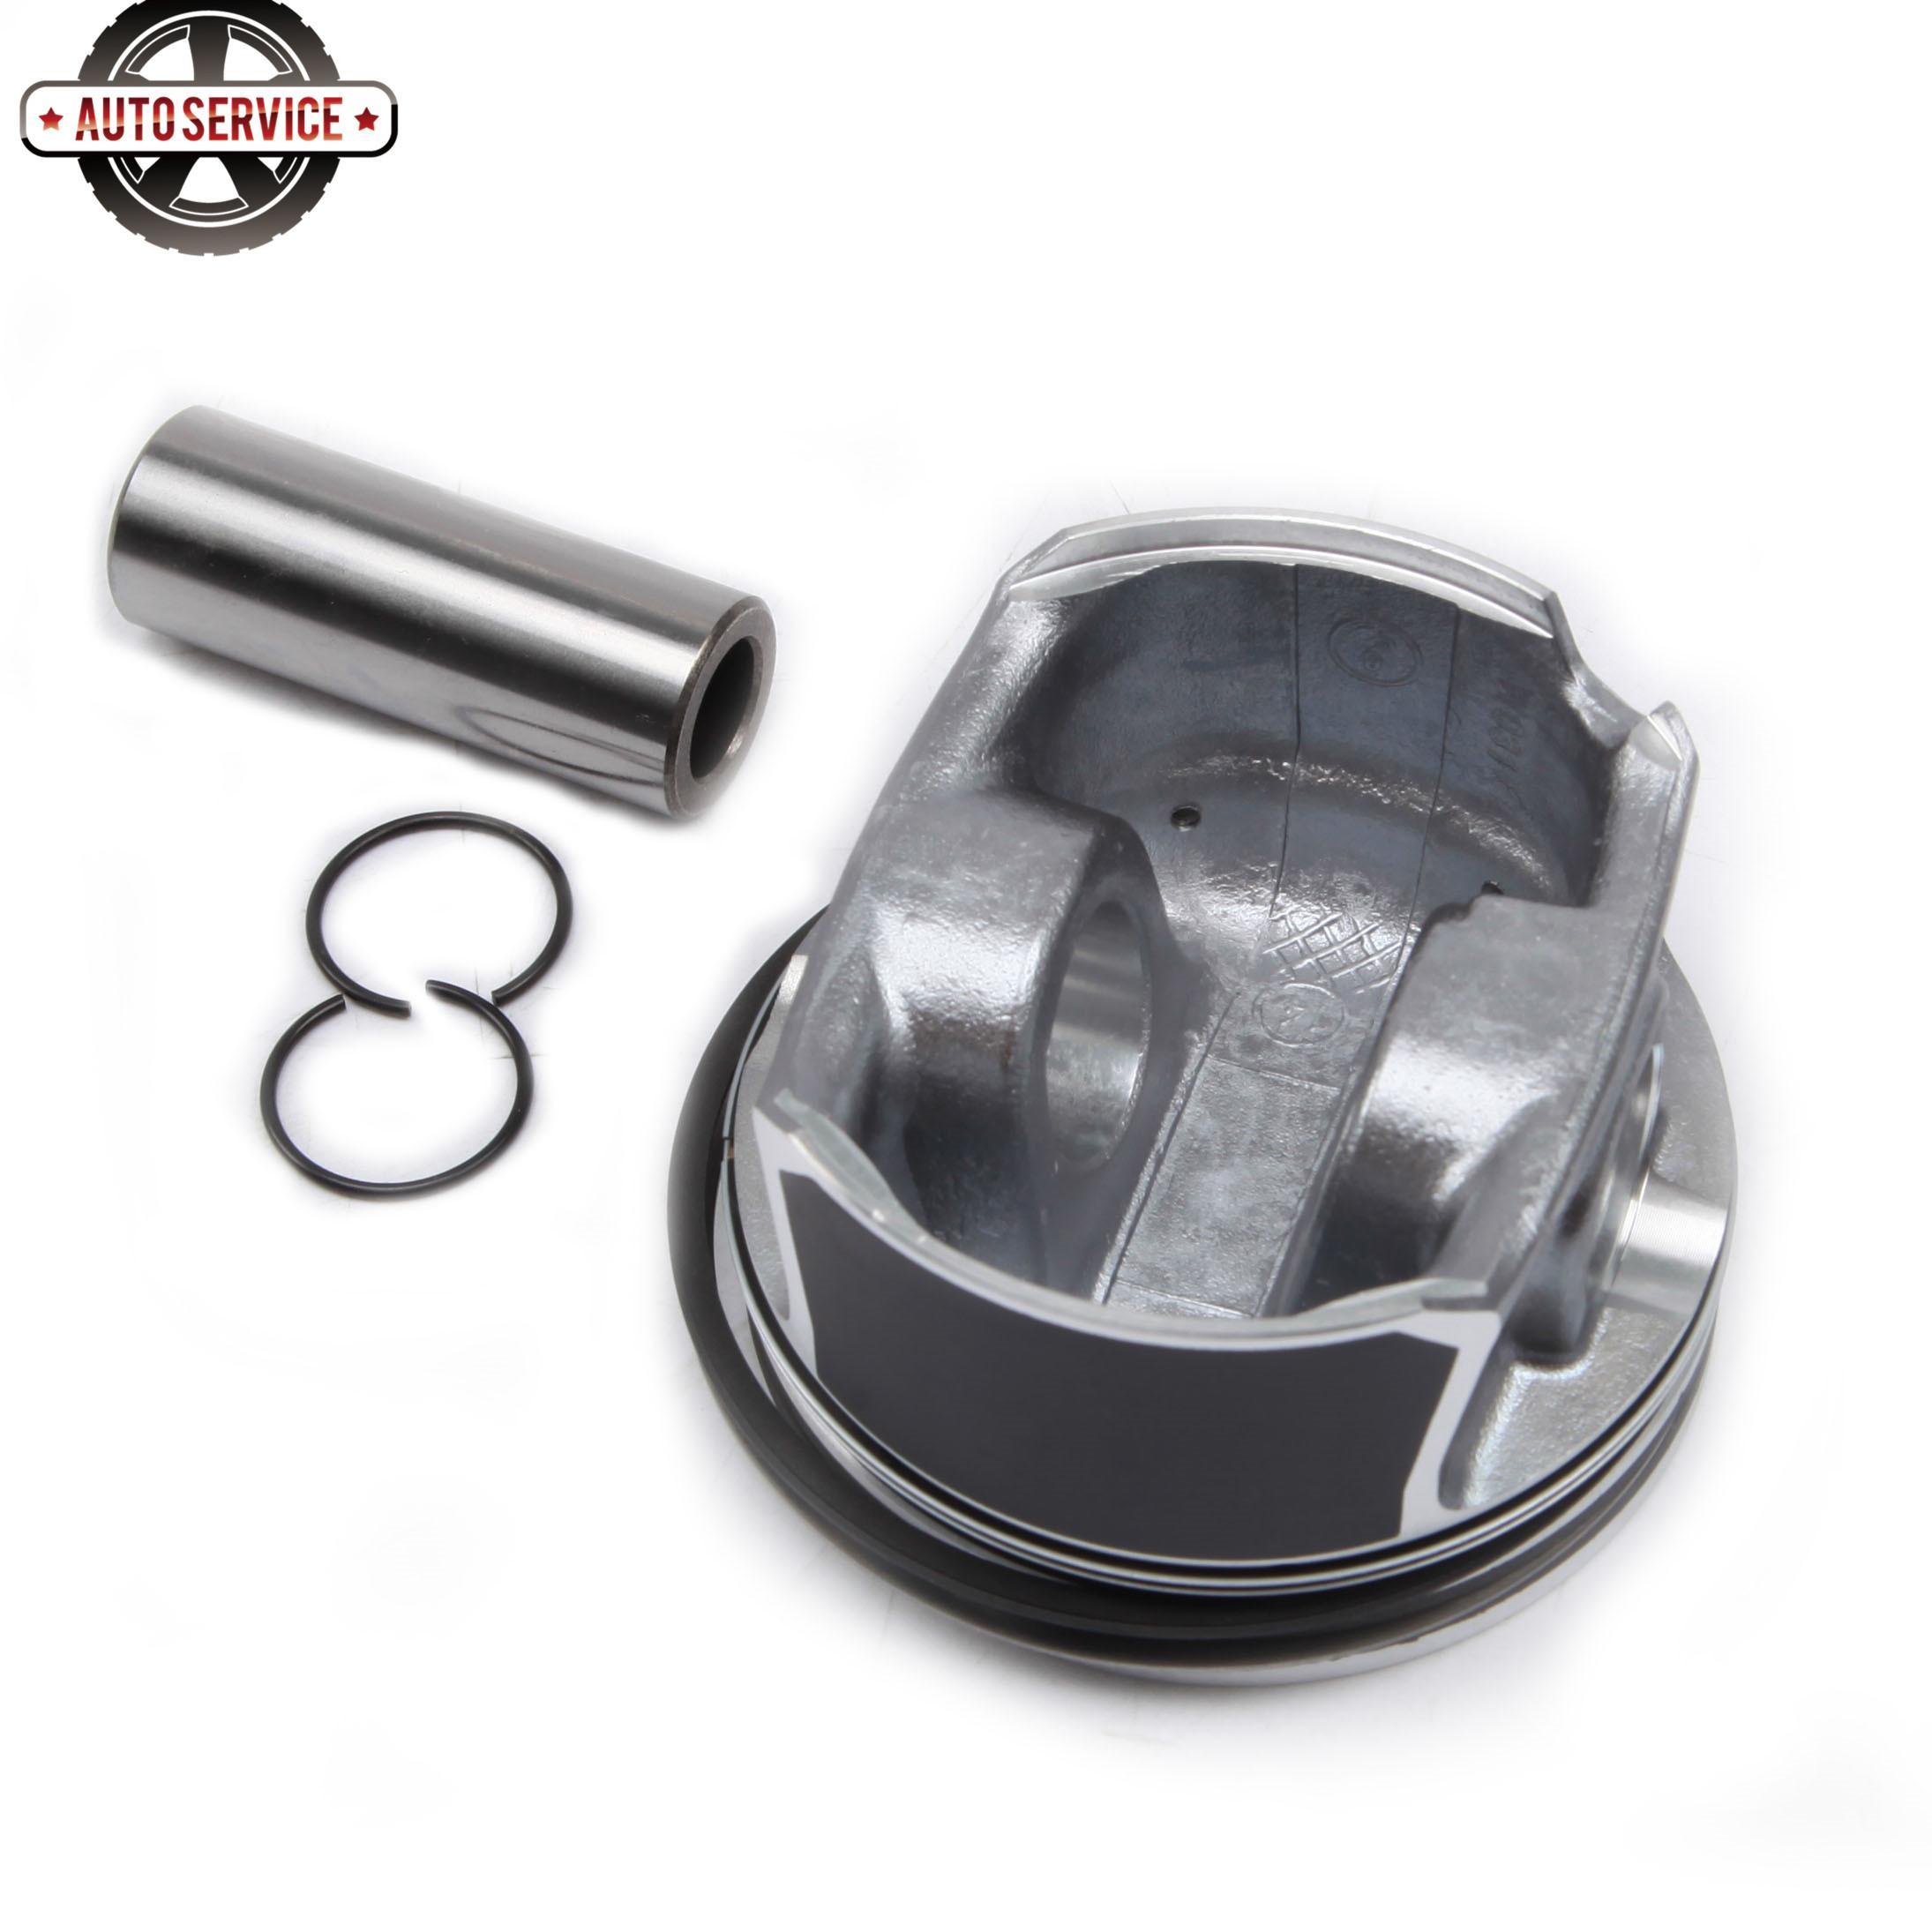 Купить с кэшбэком Car Engine Pistons & Rings Kit 82.51mm / 22mm 06D107066S For AUDI SI S3 TTS Quattro TFSI VW Golf Scirocco 2.0 R 2.0 TSI Seat